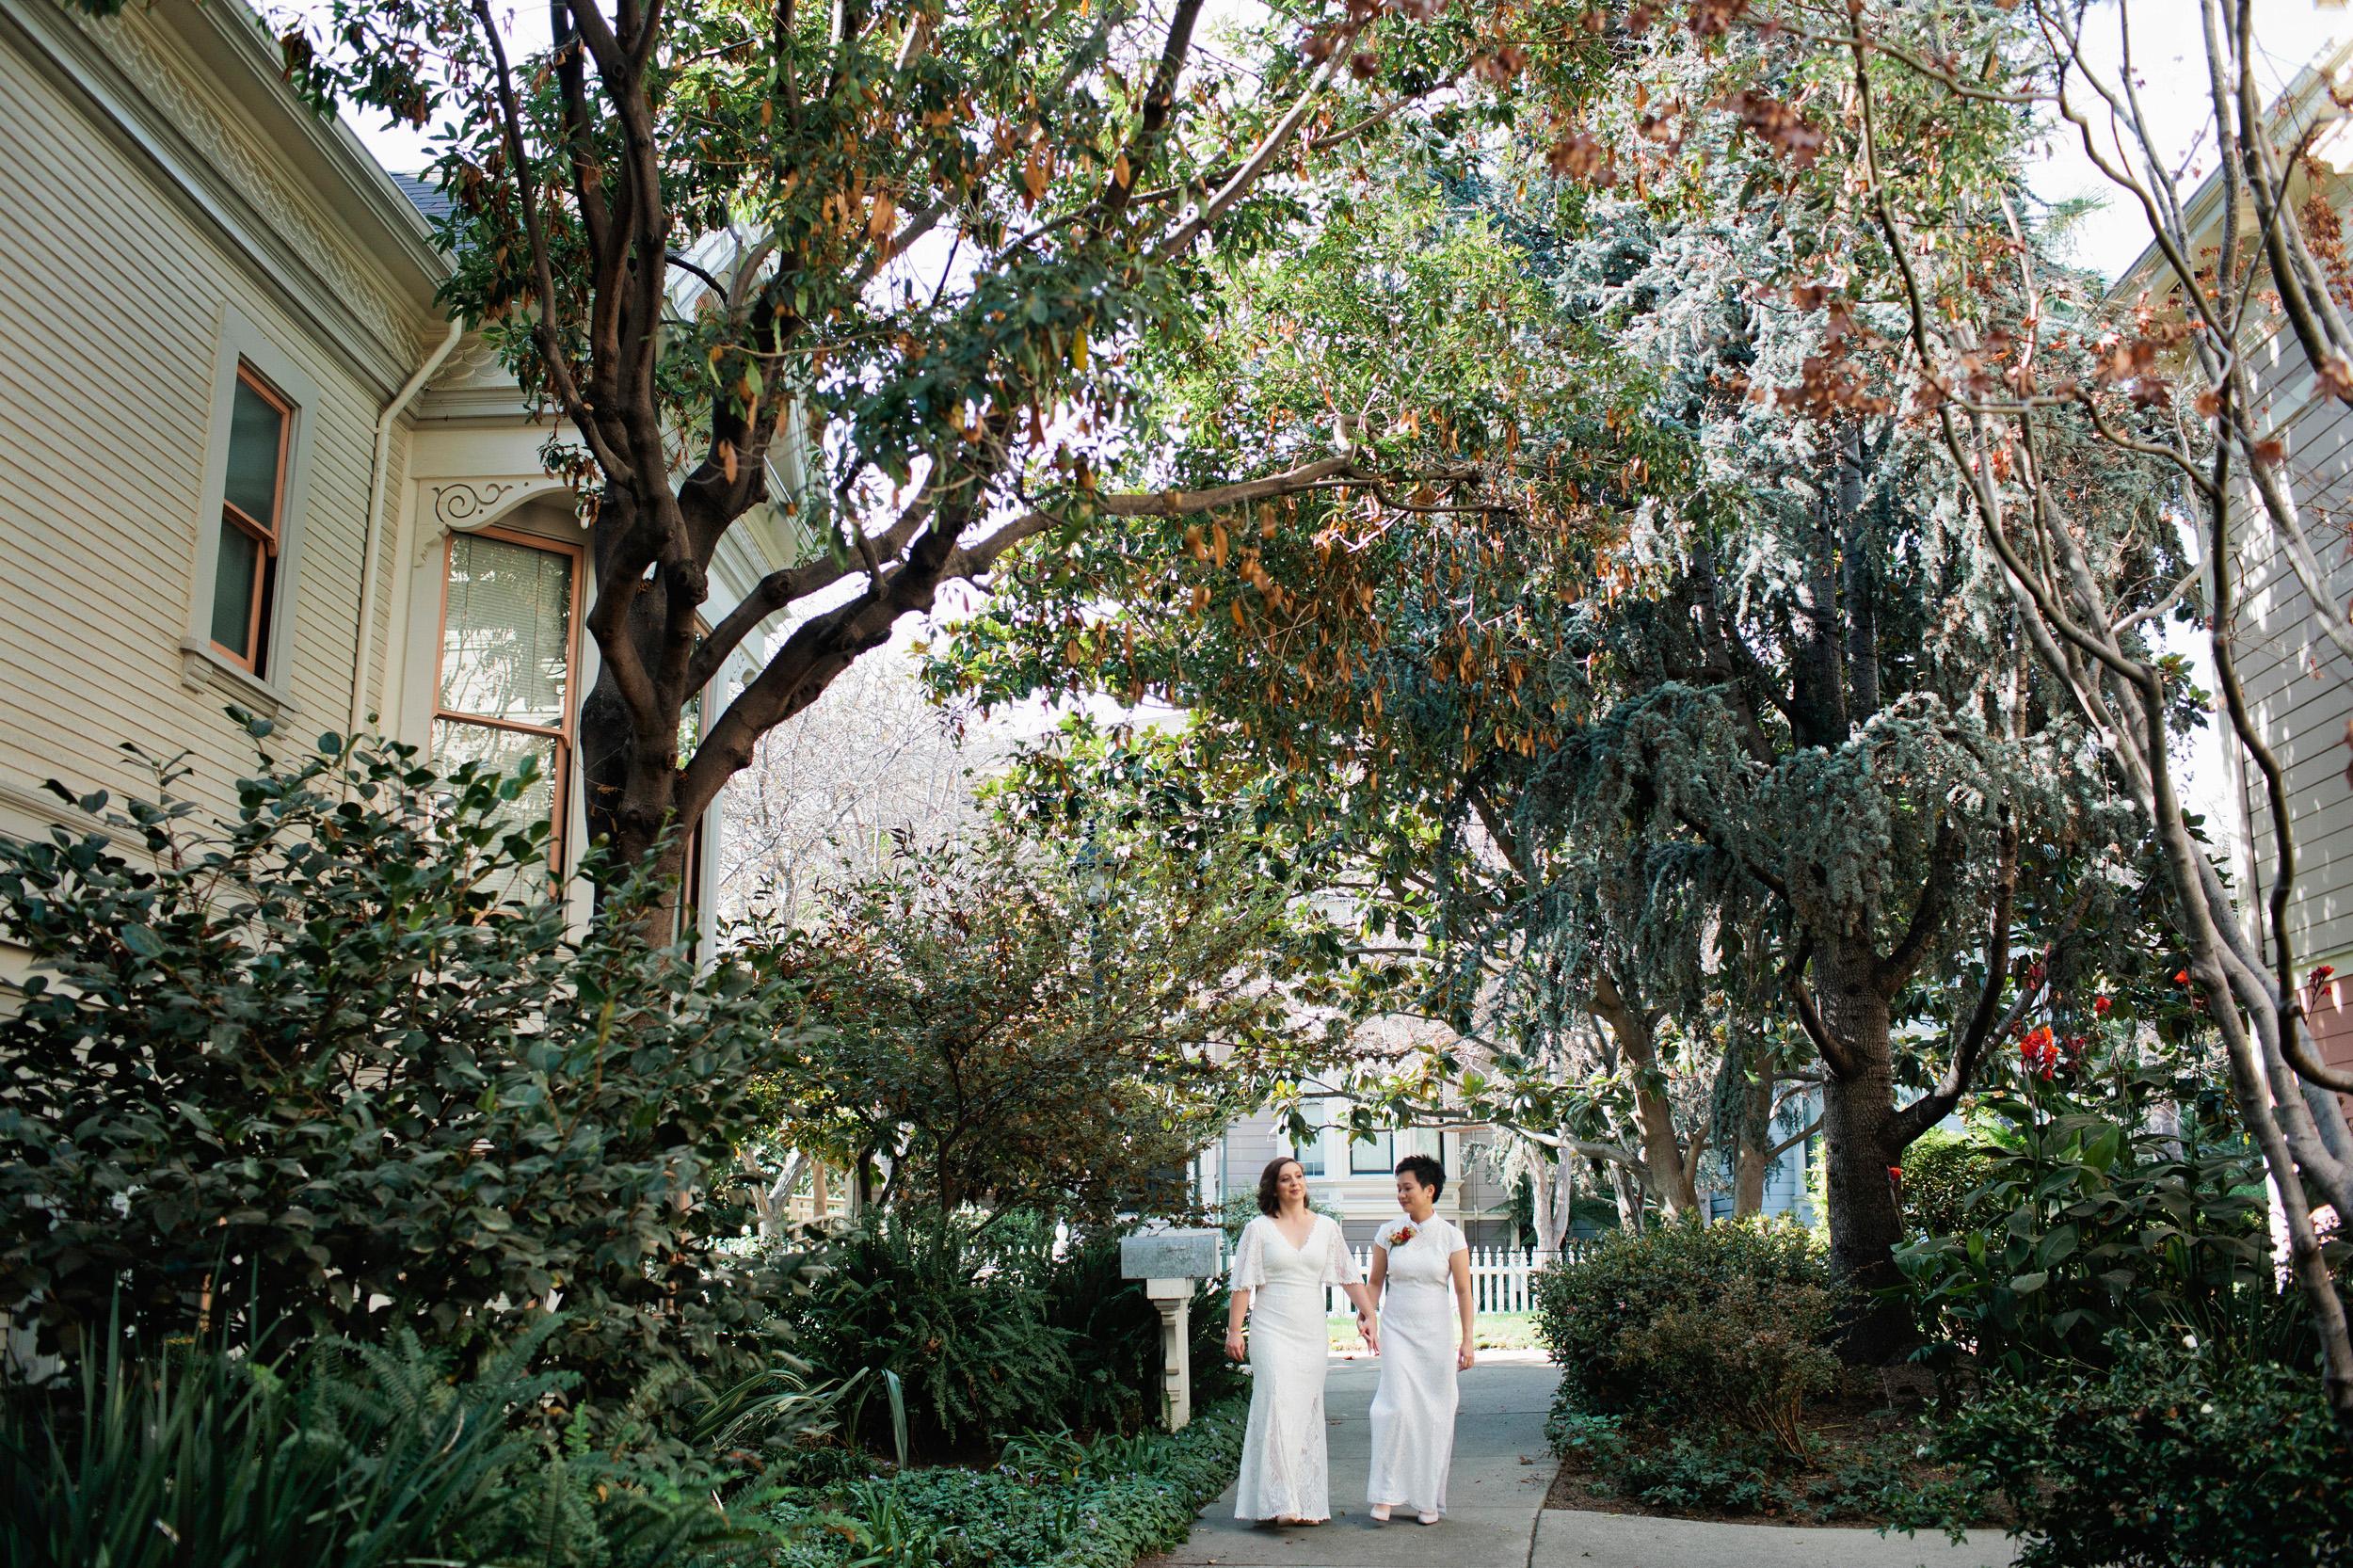 Oakland-Preservation-Park-Wedding-008.JPG